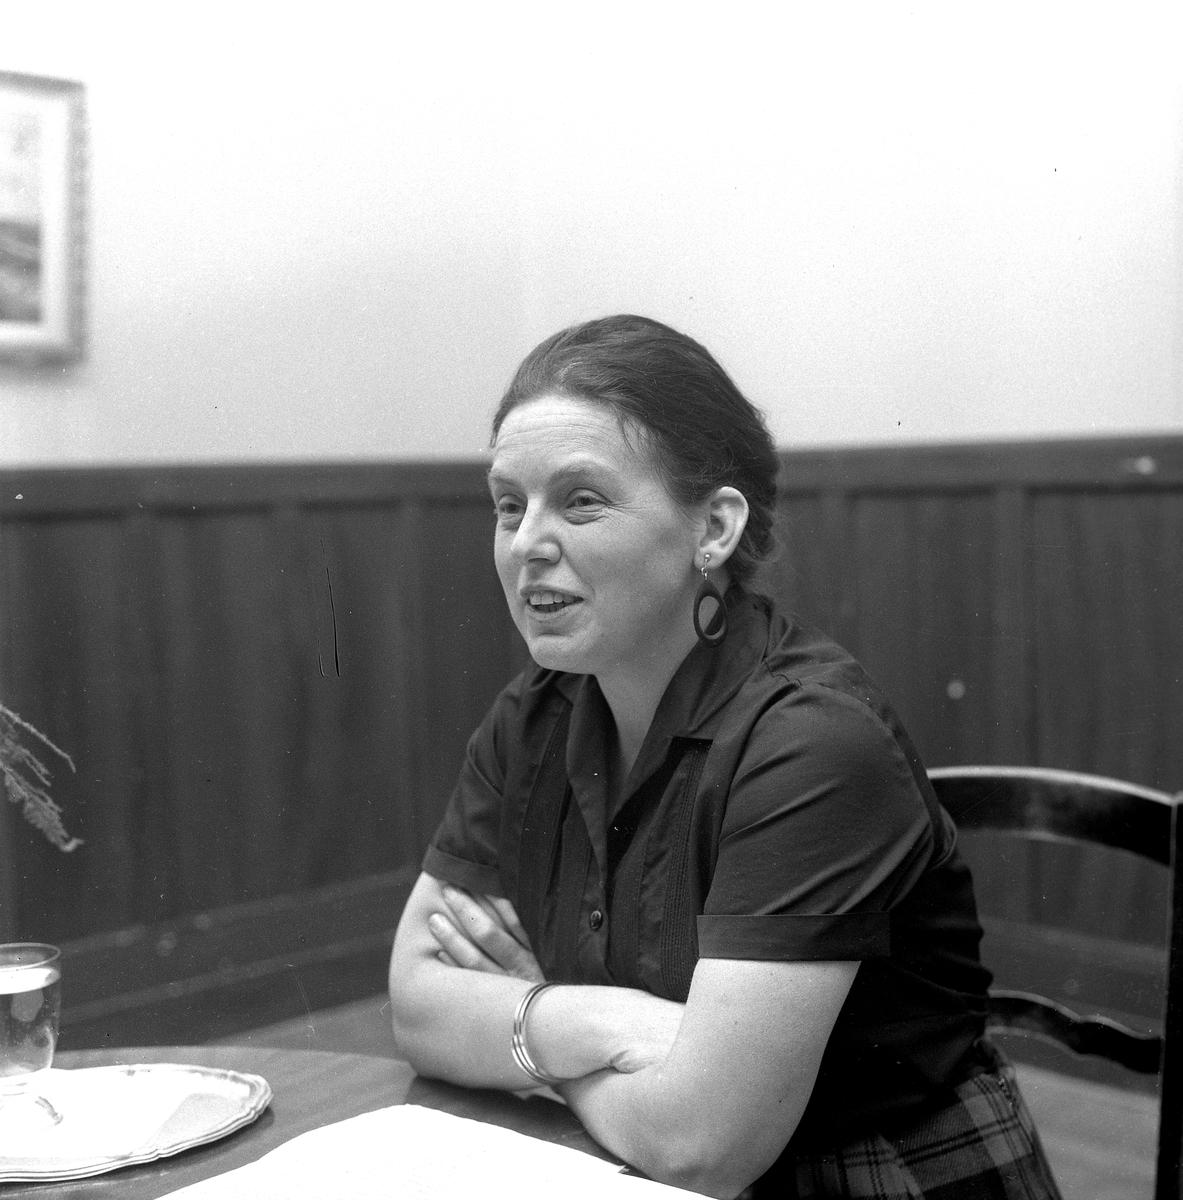 Viveka Heyman. 25 november 1958.